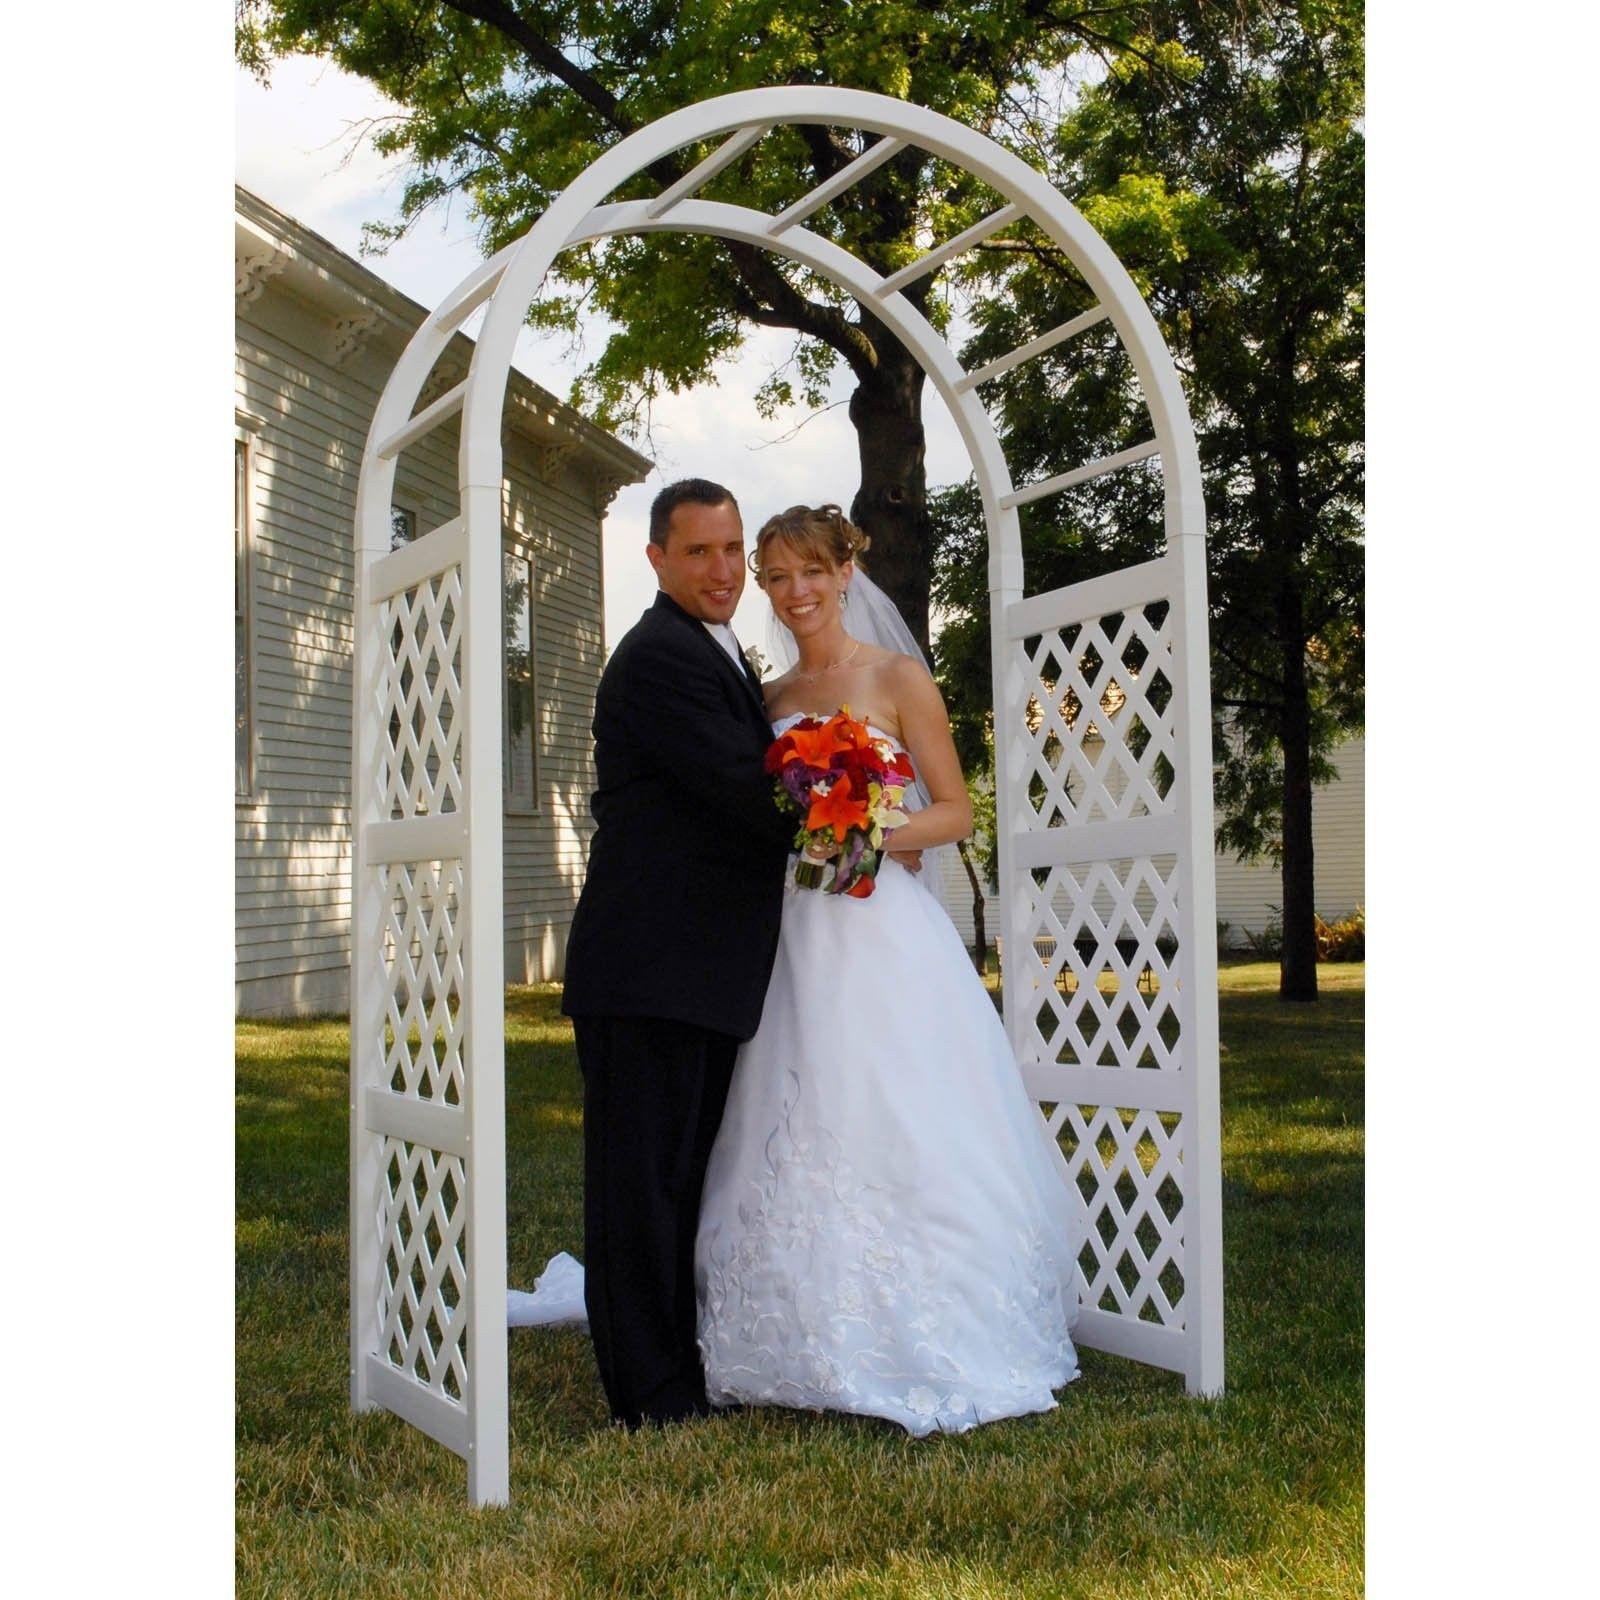 Garden Wedding Arch Arbor White Vinyl 7.5 Ft Anchors